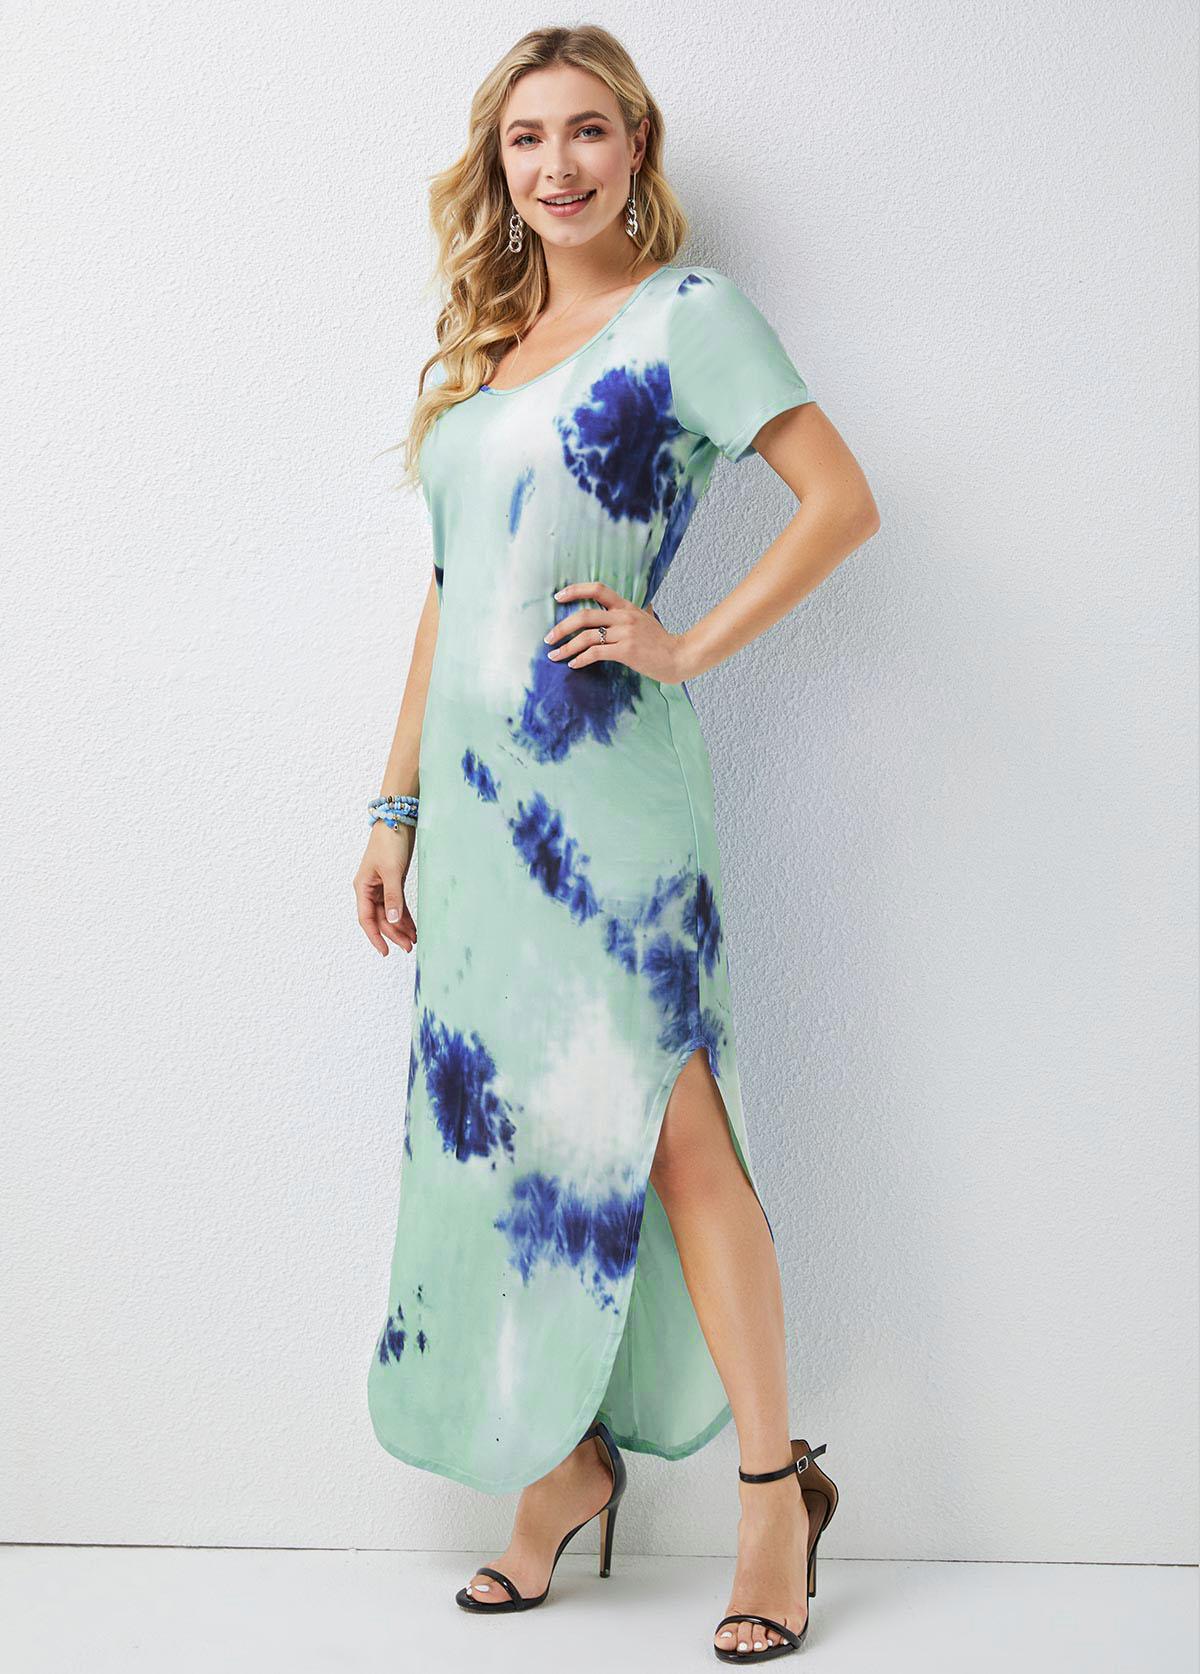 Short Sleeve Tie Dye Print Round Neck Dress